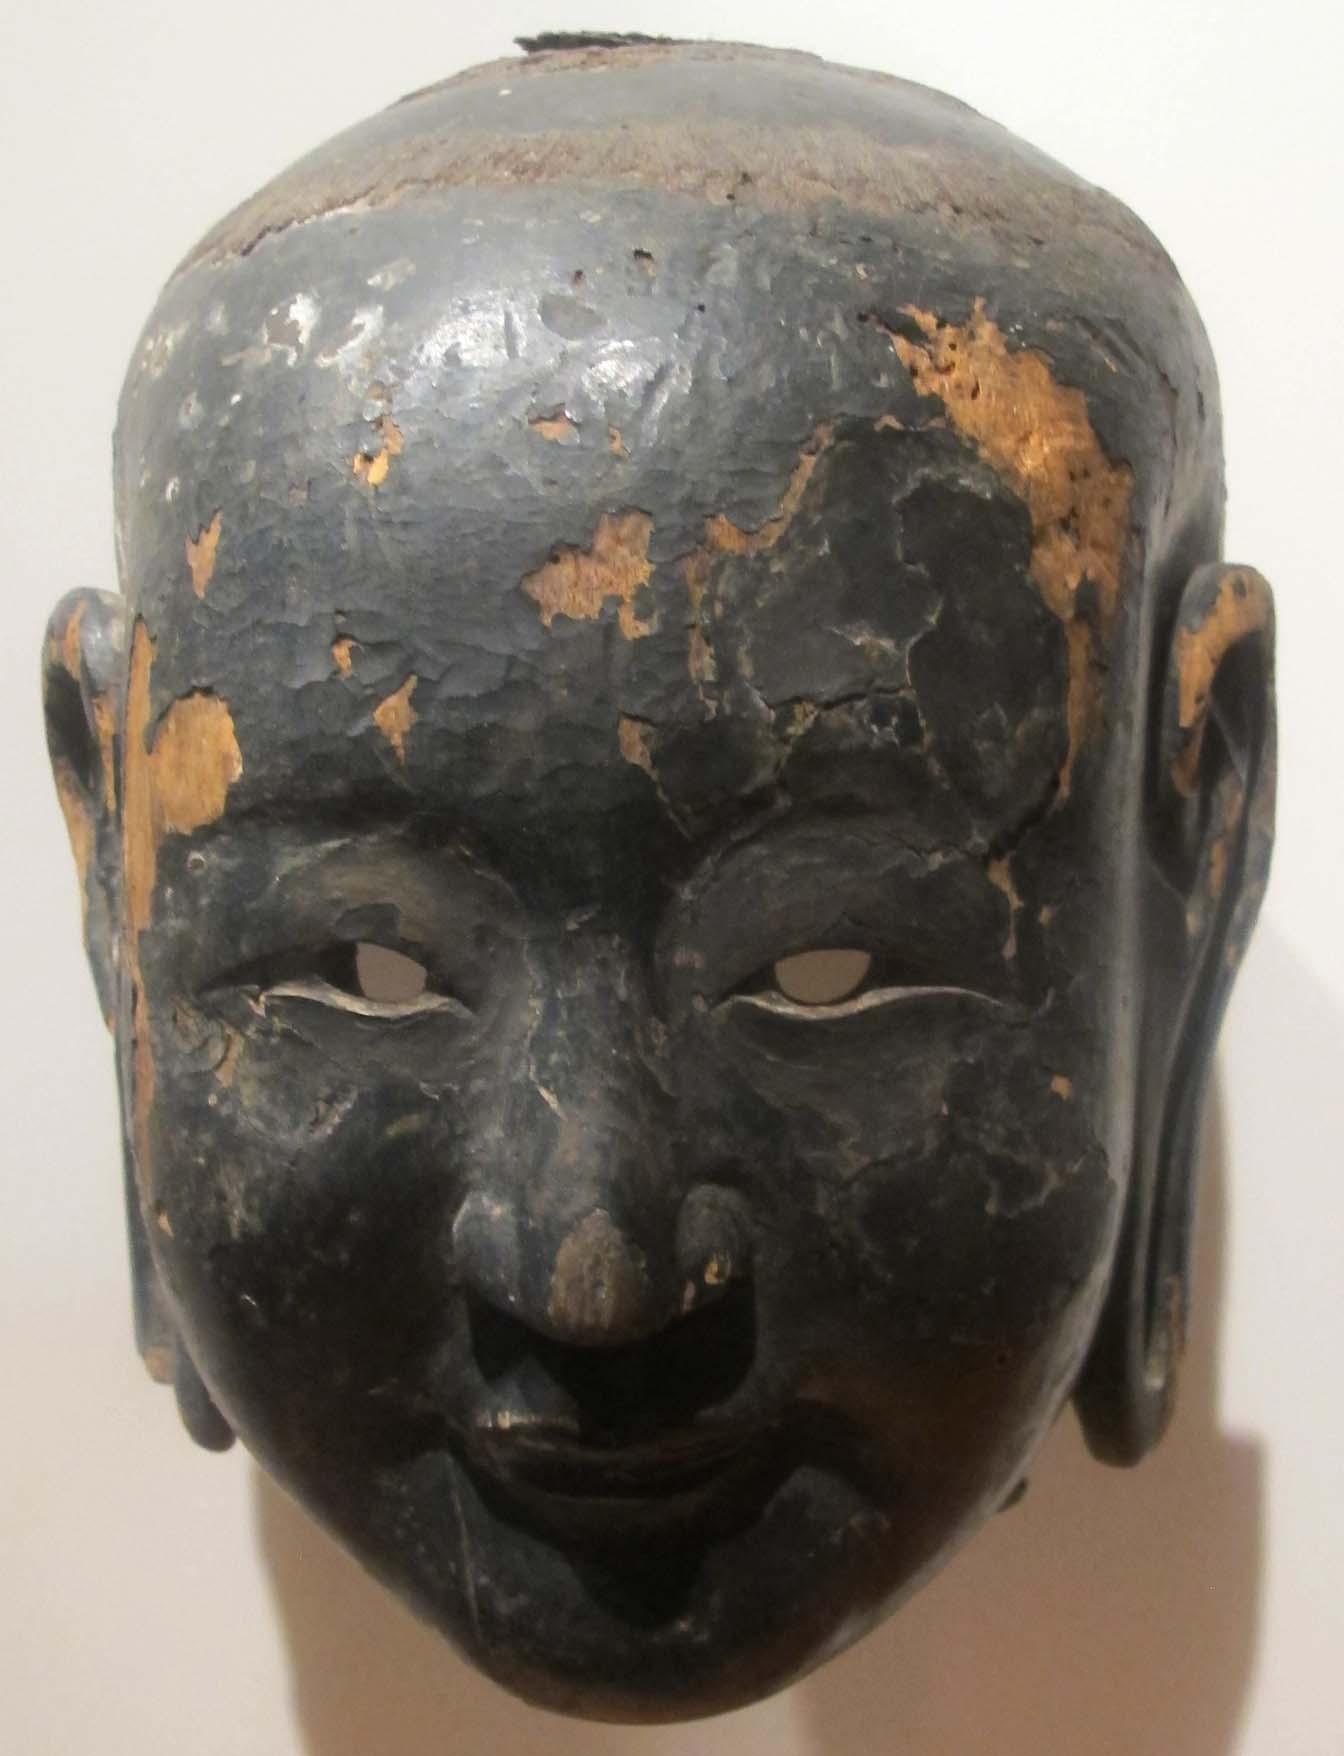 http://upload.wikimedia.org/wikipedia/commons/b/b2/Epoca_nara,_maschere_per_gigaku,_goko-shishiko,_VIII_sec.JPG